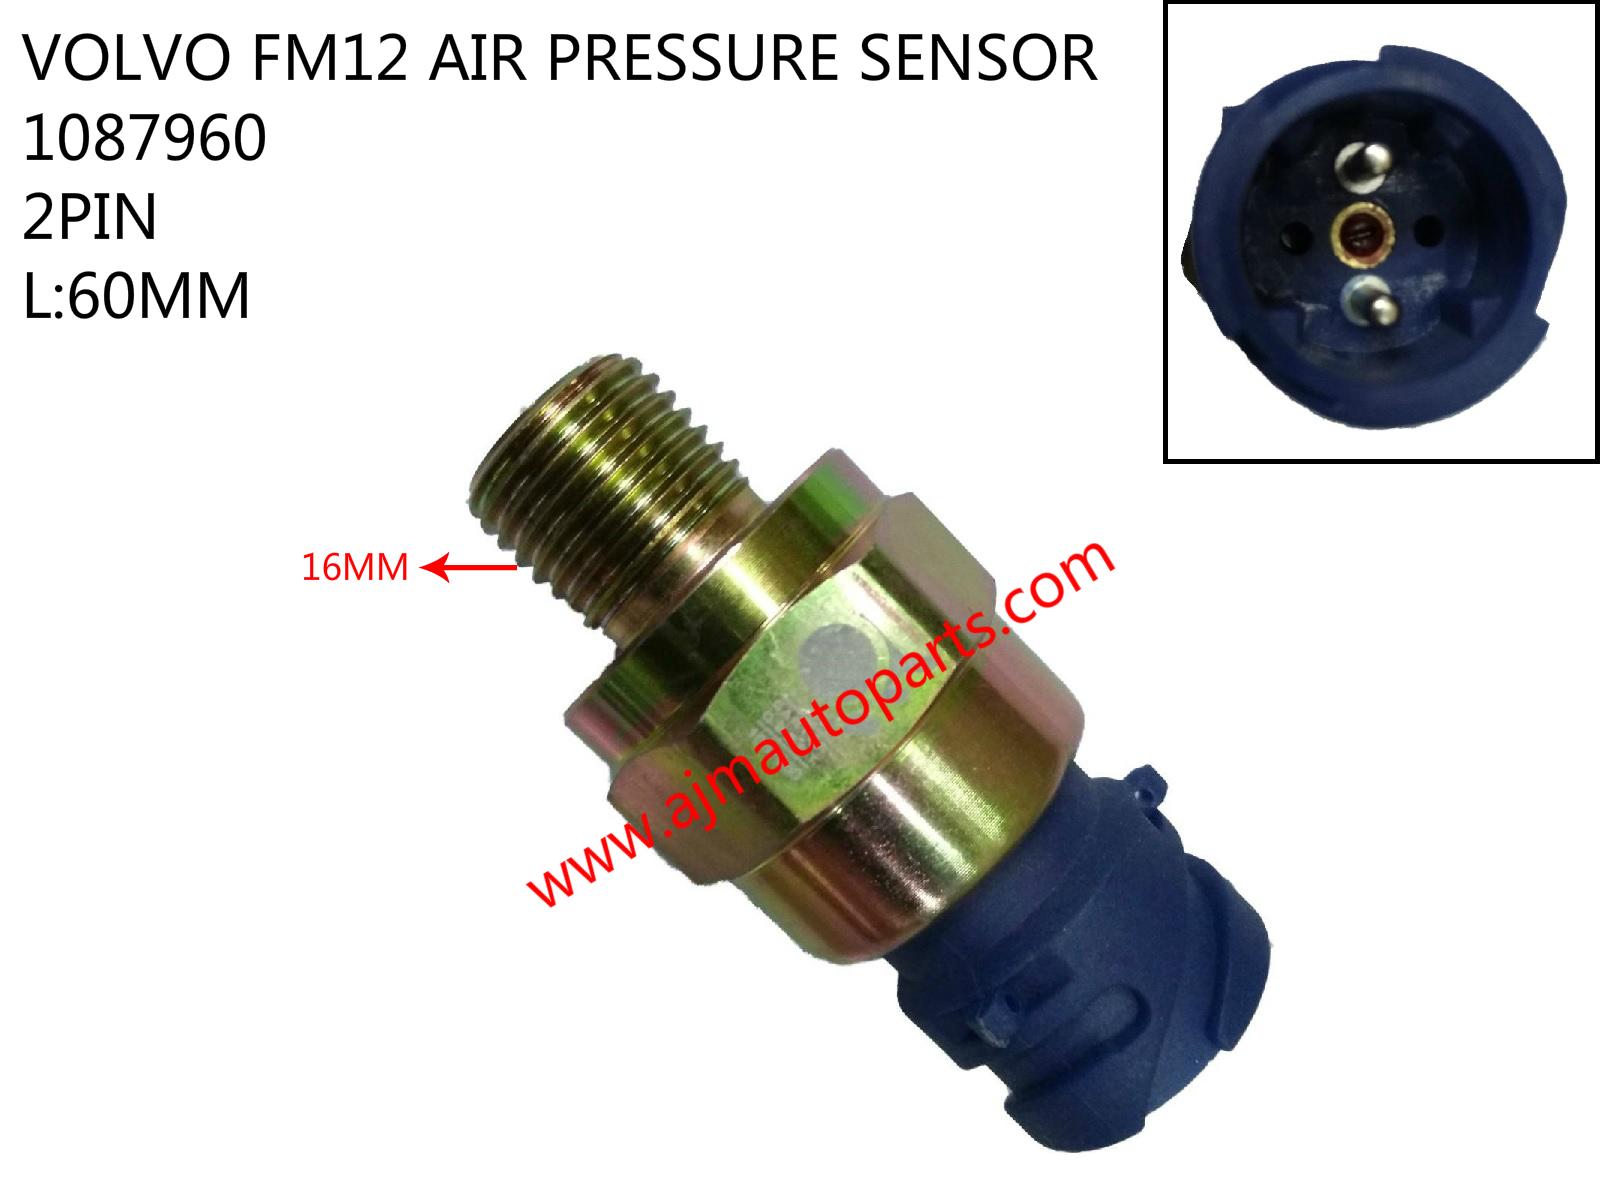 VOLVO FM12 AIR PRESSURE SENSOR-1087960